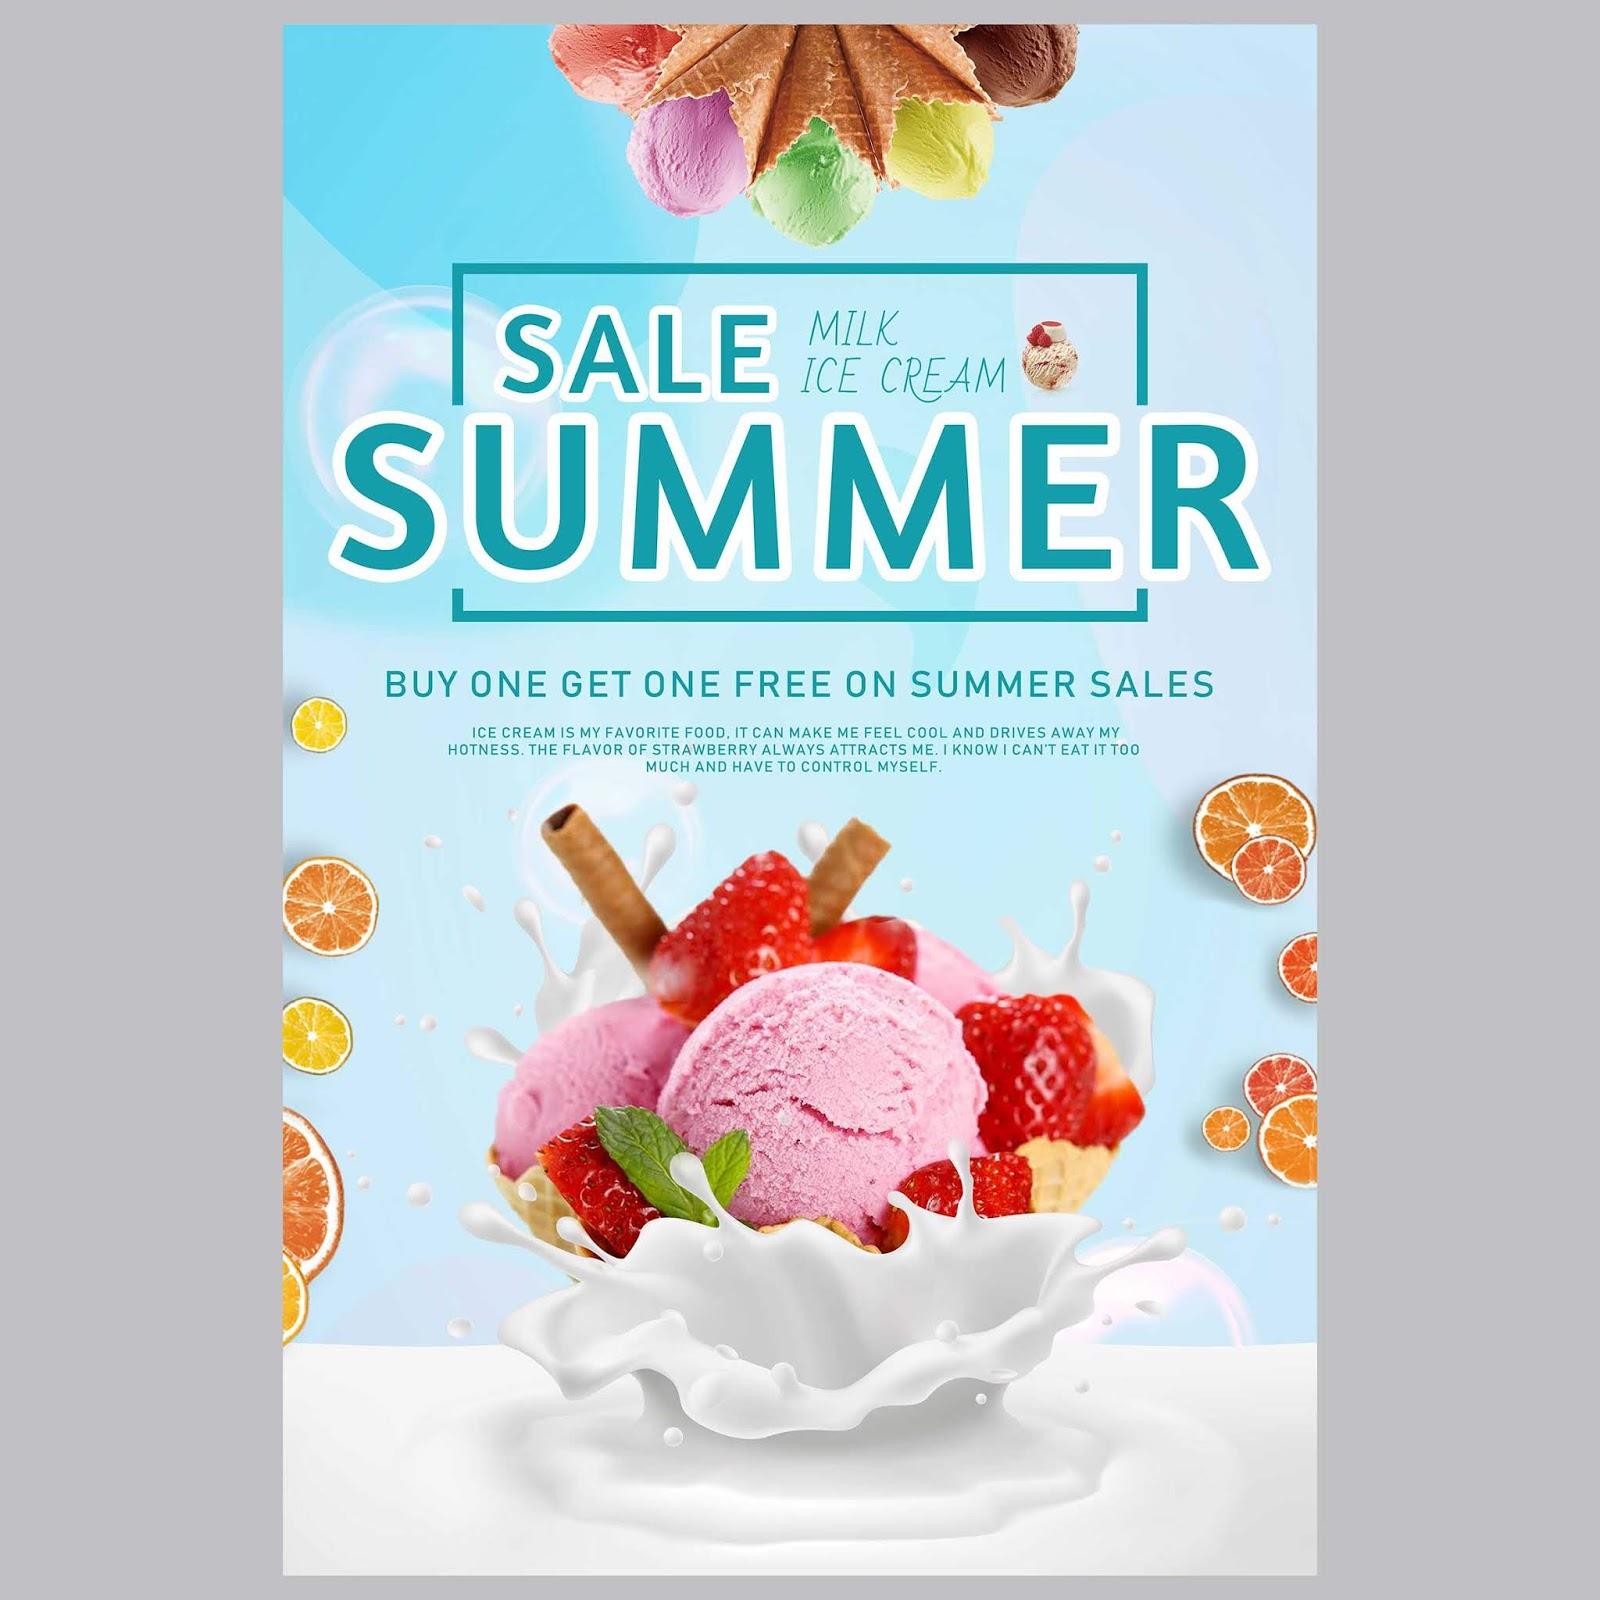 milk ice cream summer promotion poster